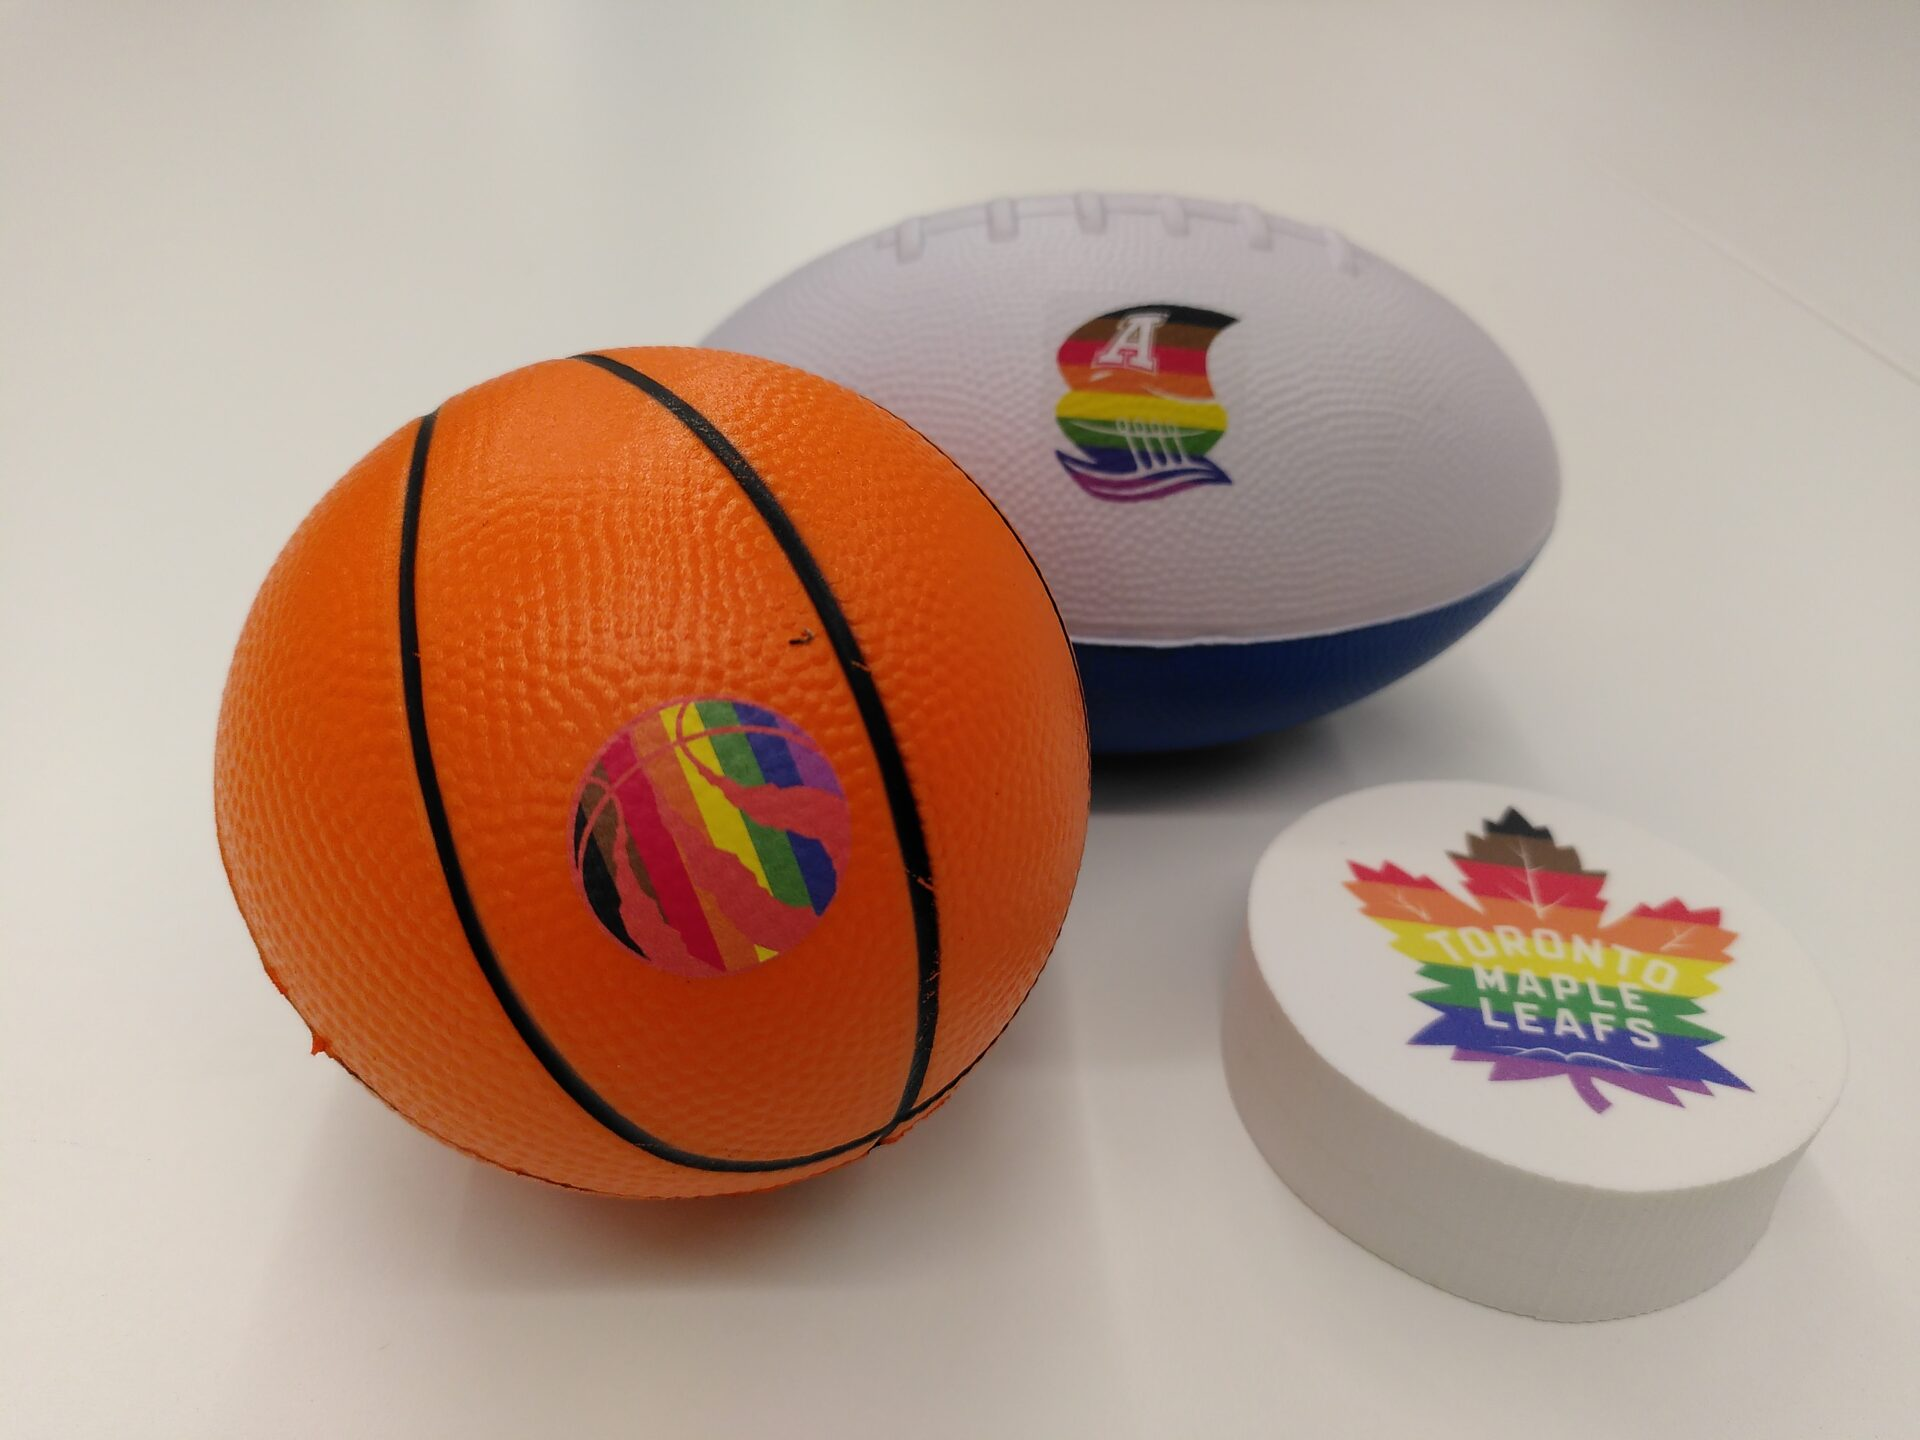 A MLSE Themed tiny basketball, football and puck